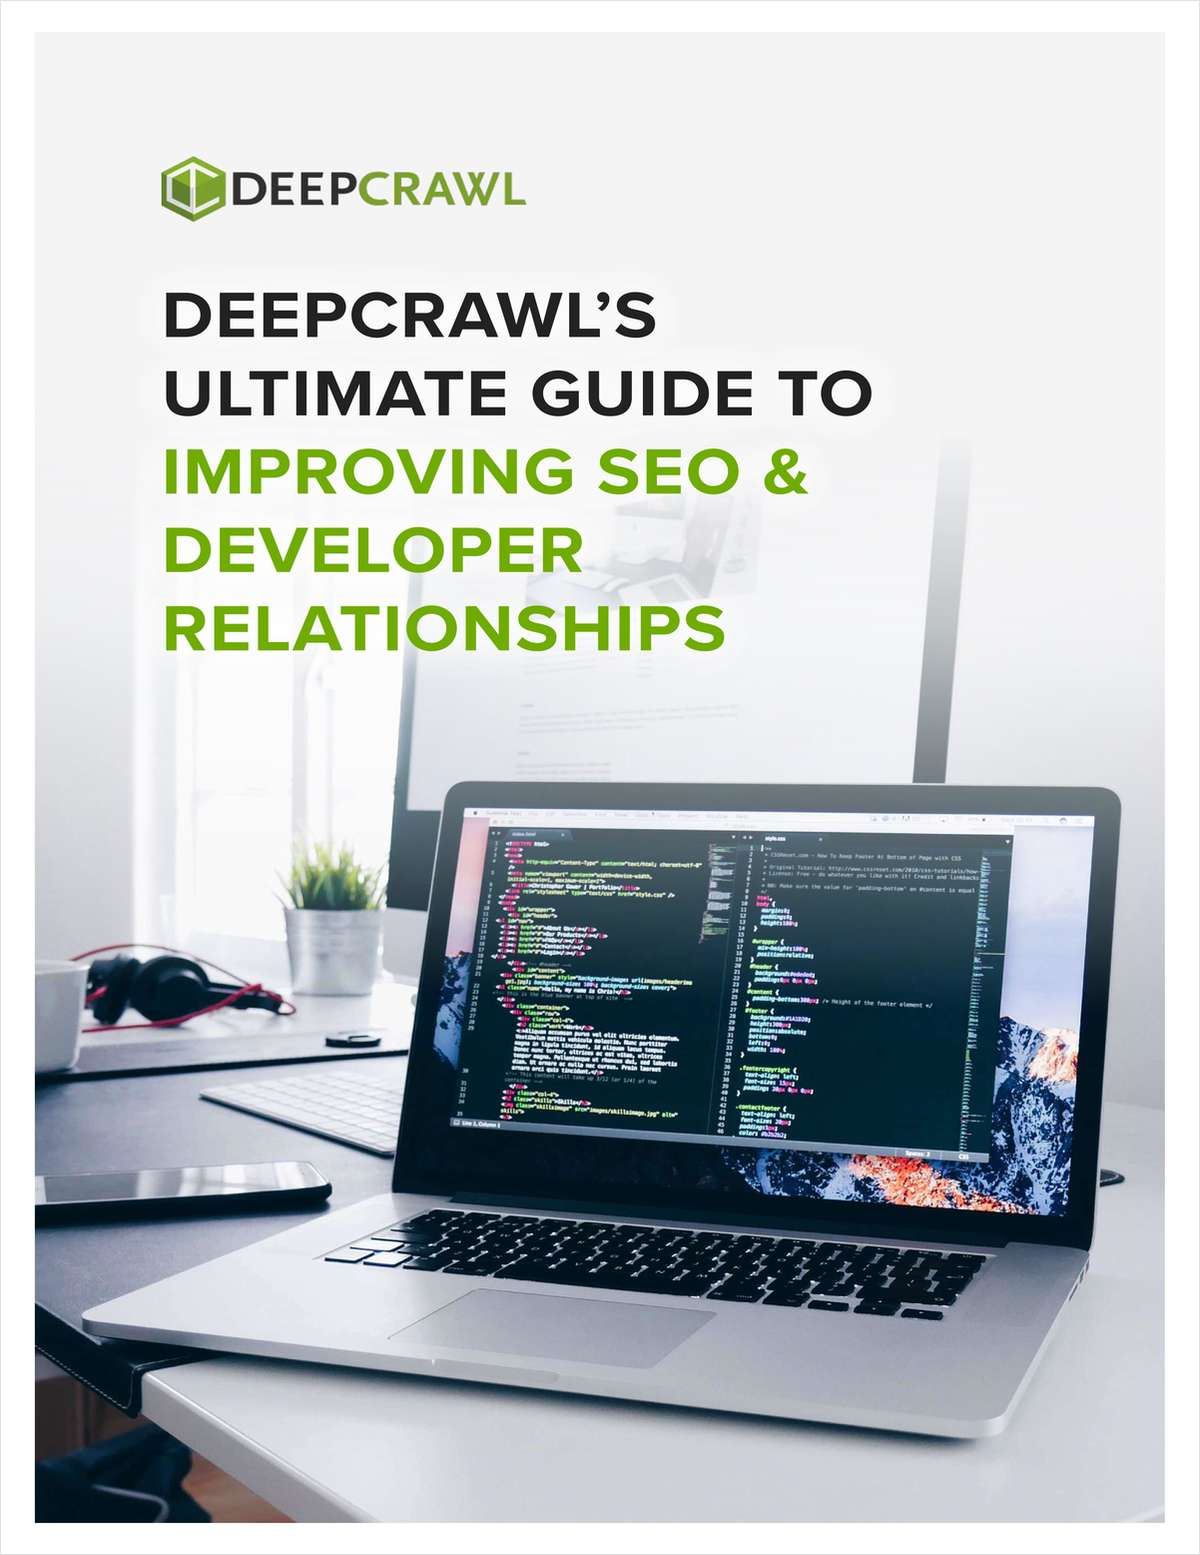 DeepCrawl's Improving SEO & Developer Relationships - The Ultimate Guide